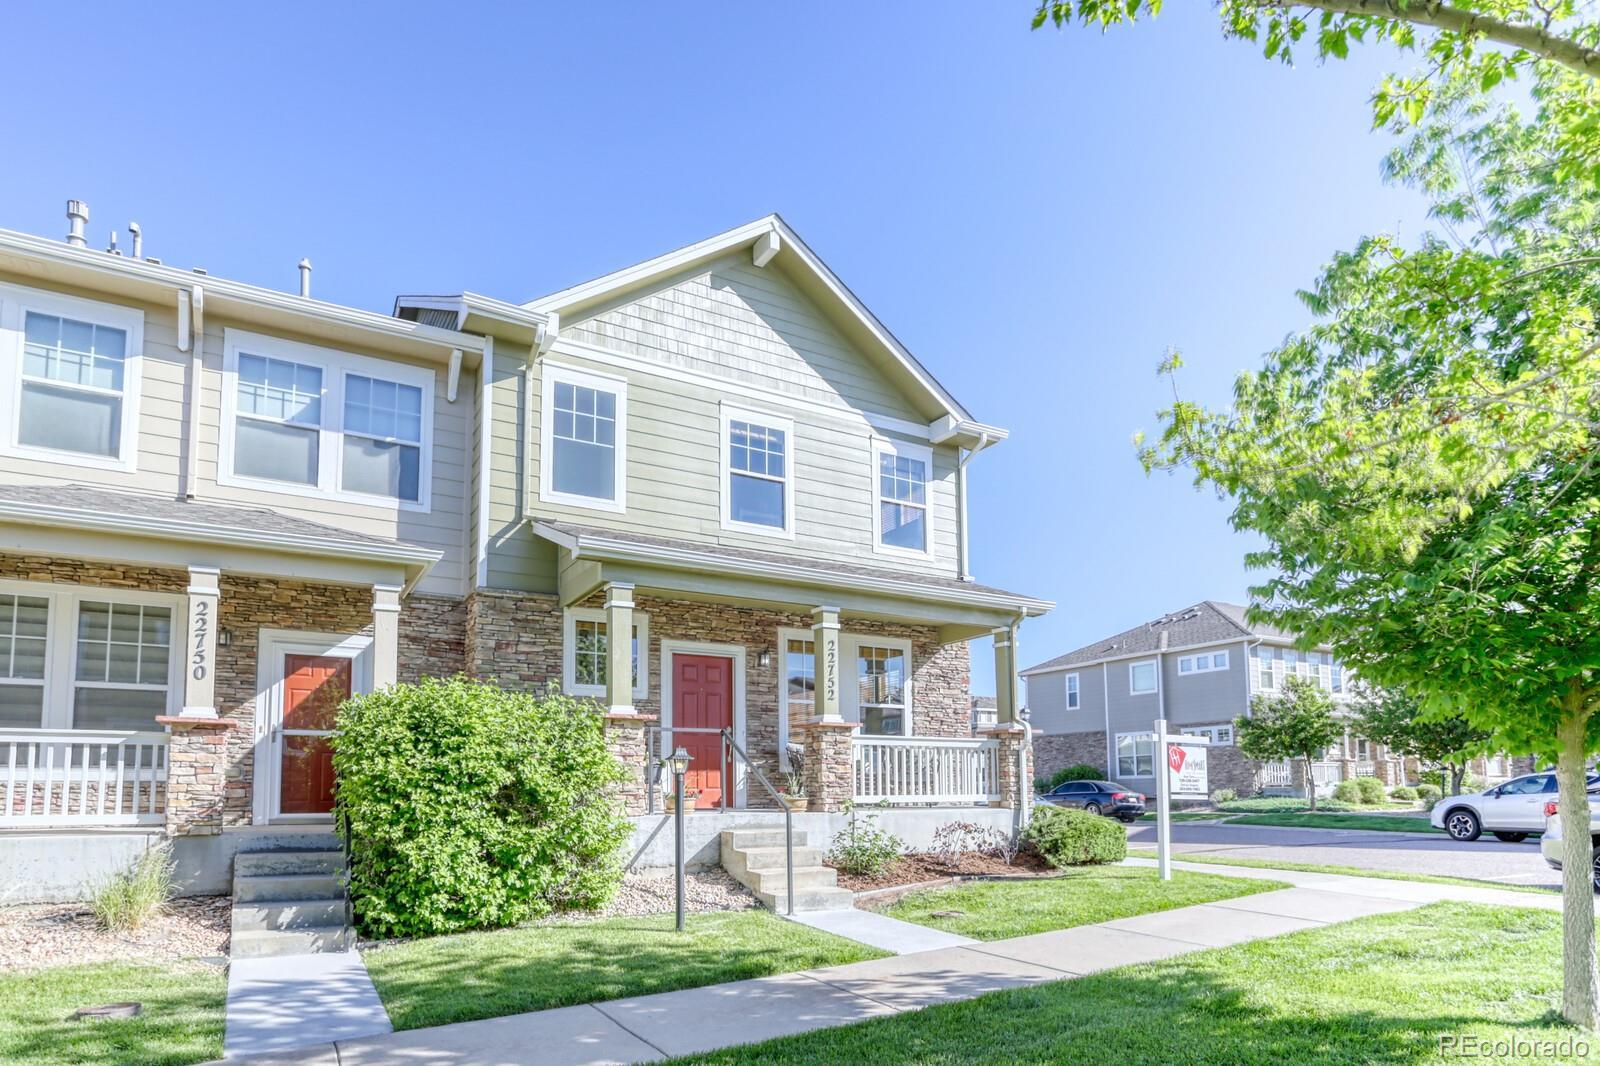 MLS# 8551789 - 2 - 22752 E Briarwood Place, Aurora, CO 80016